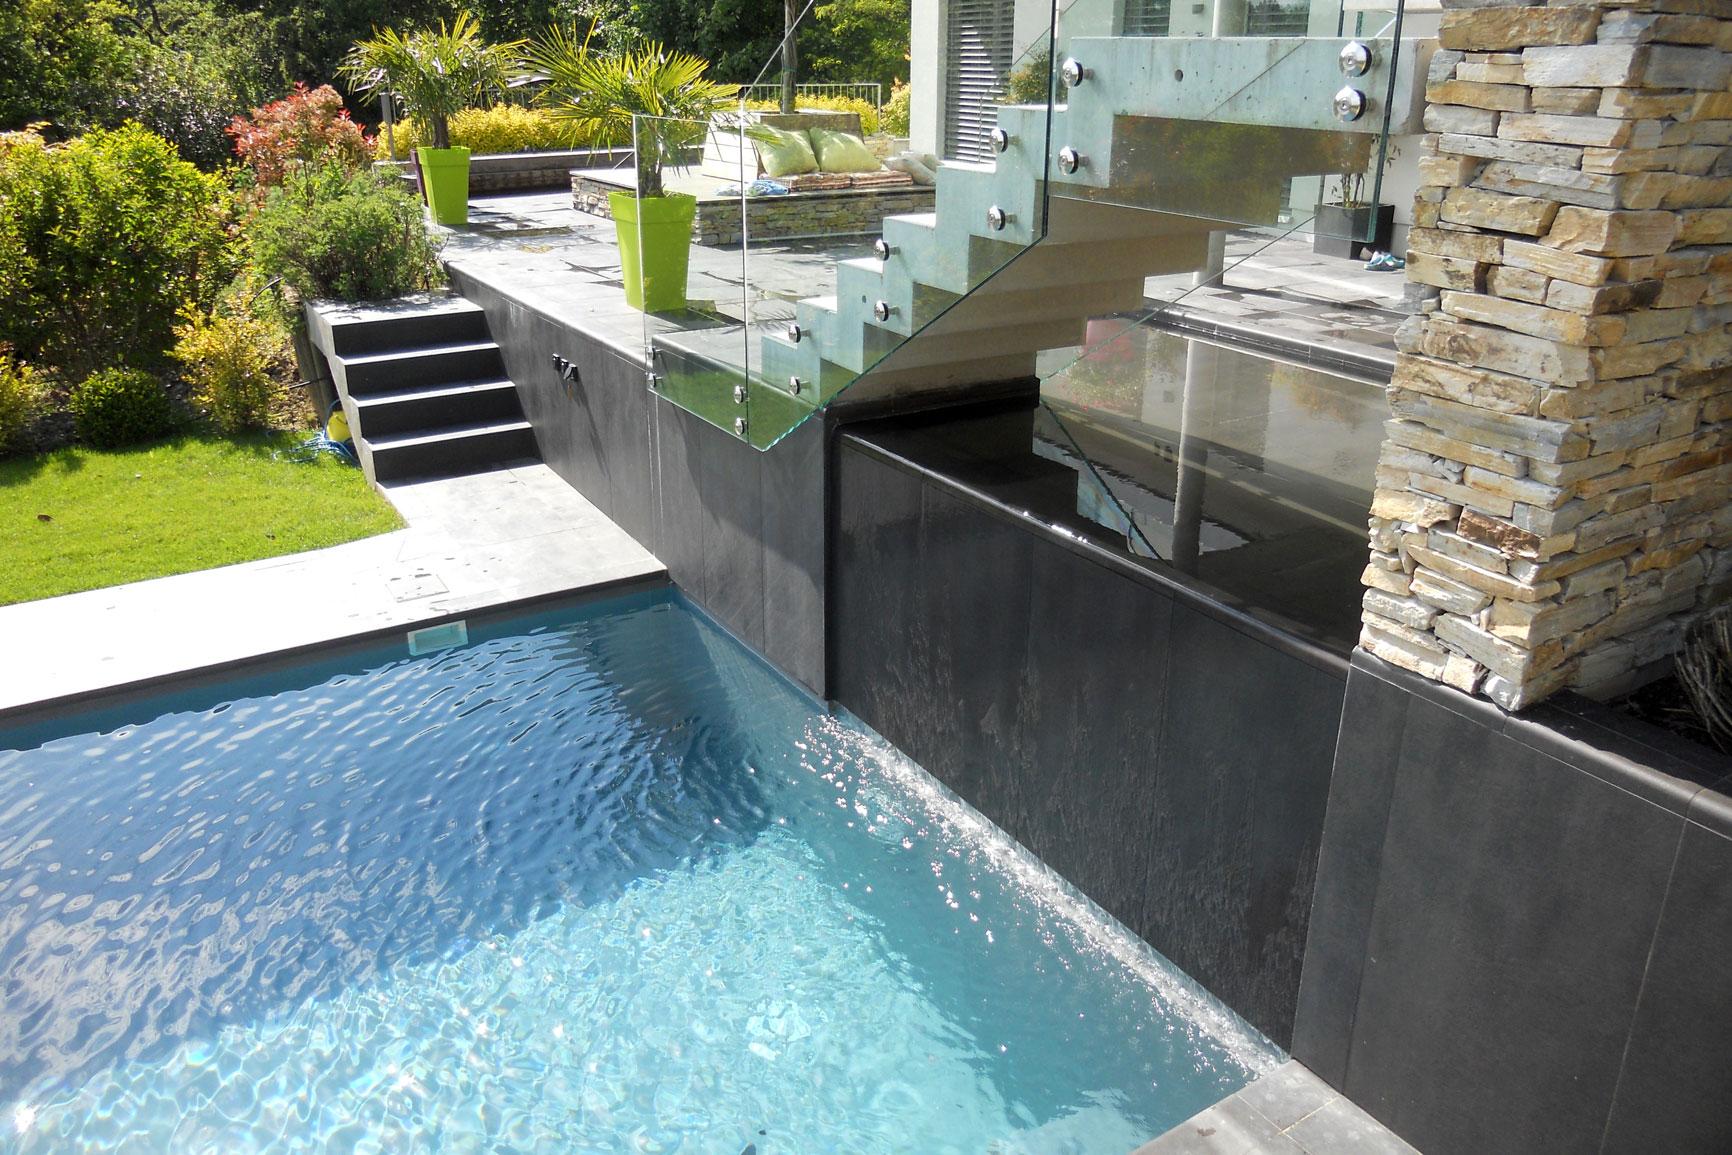 Classique liner piscines widmer for Piscine petit bassin